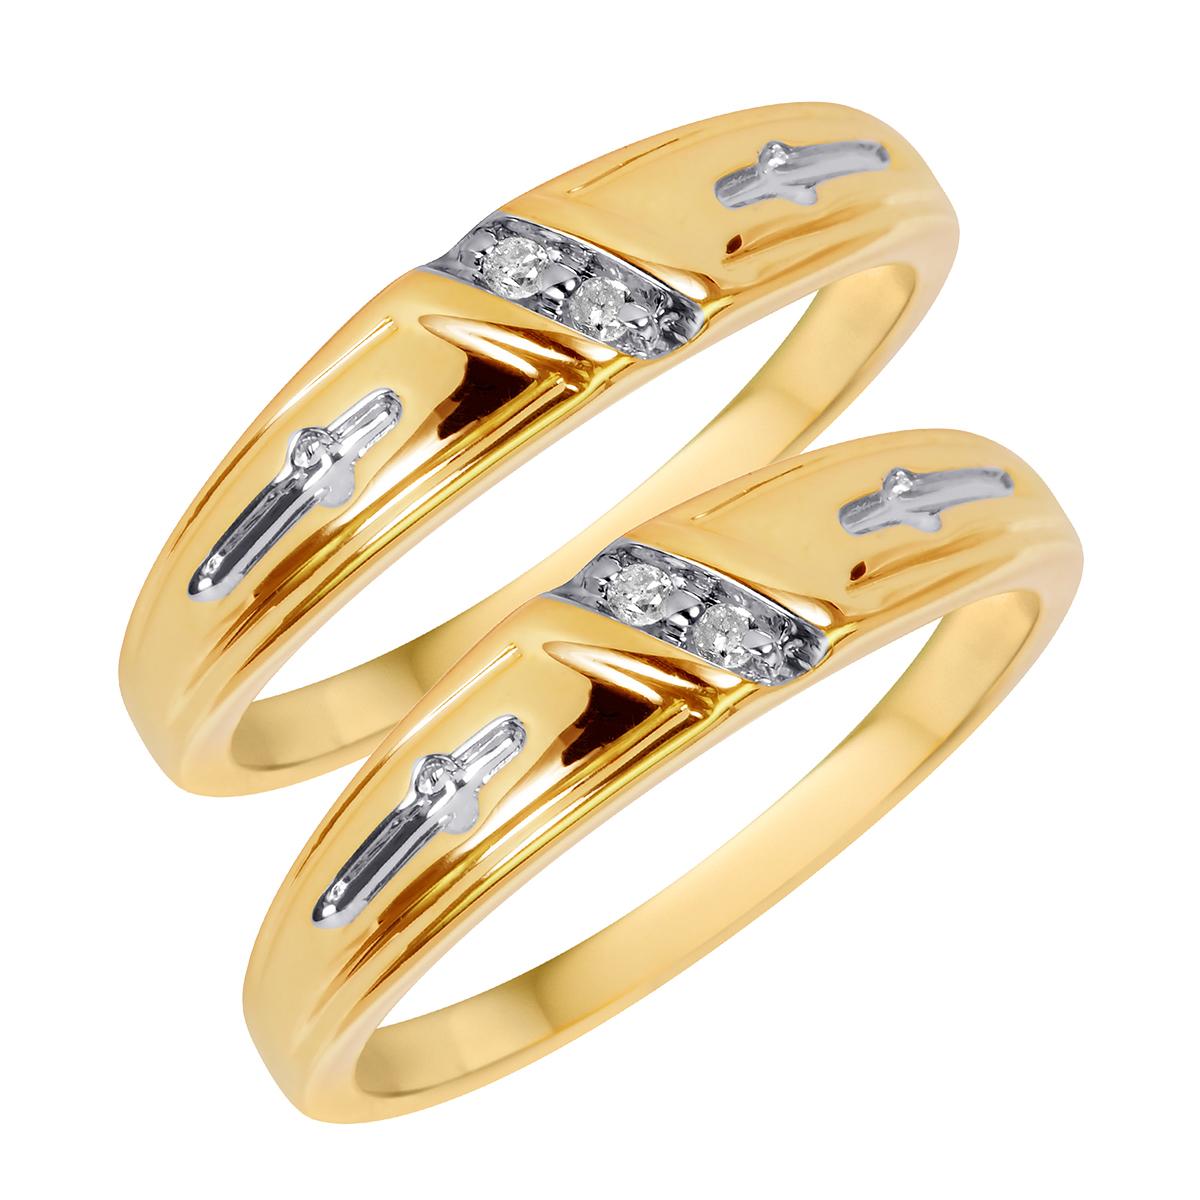 1/20 CT. T.W. Round Cut Ladies Same Sex Wedding Band Set 14K Yellow Gold- Size 8